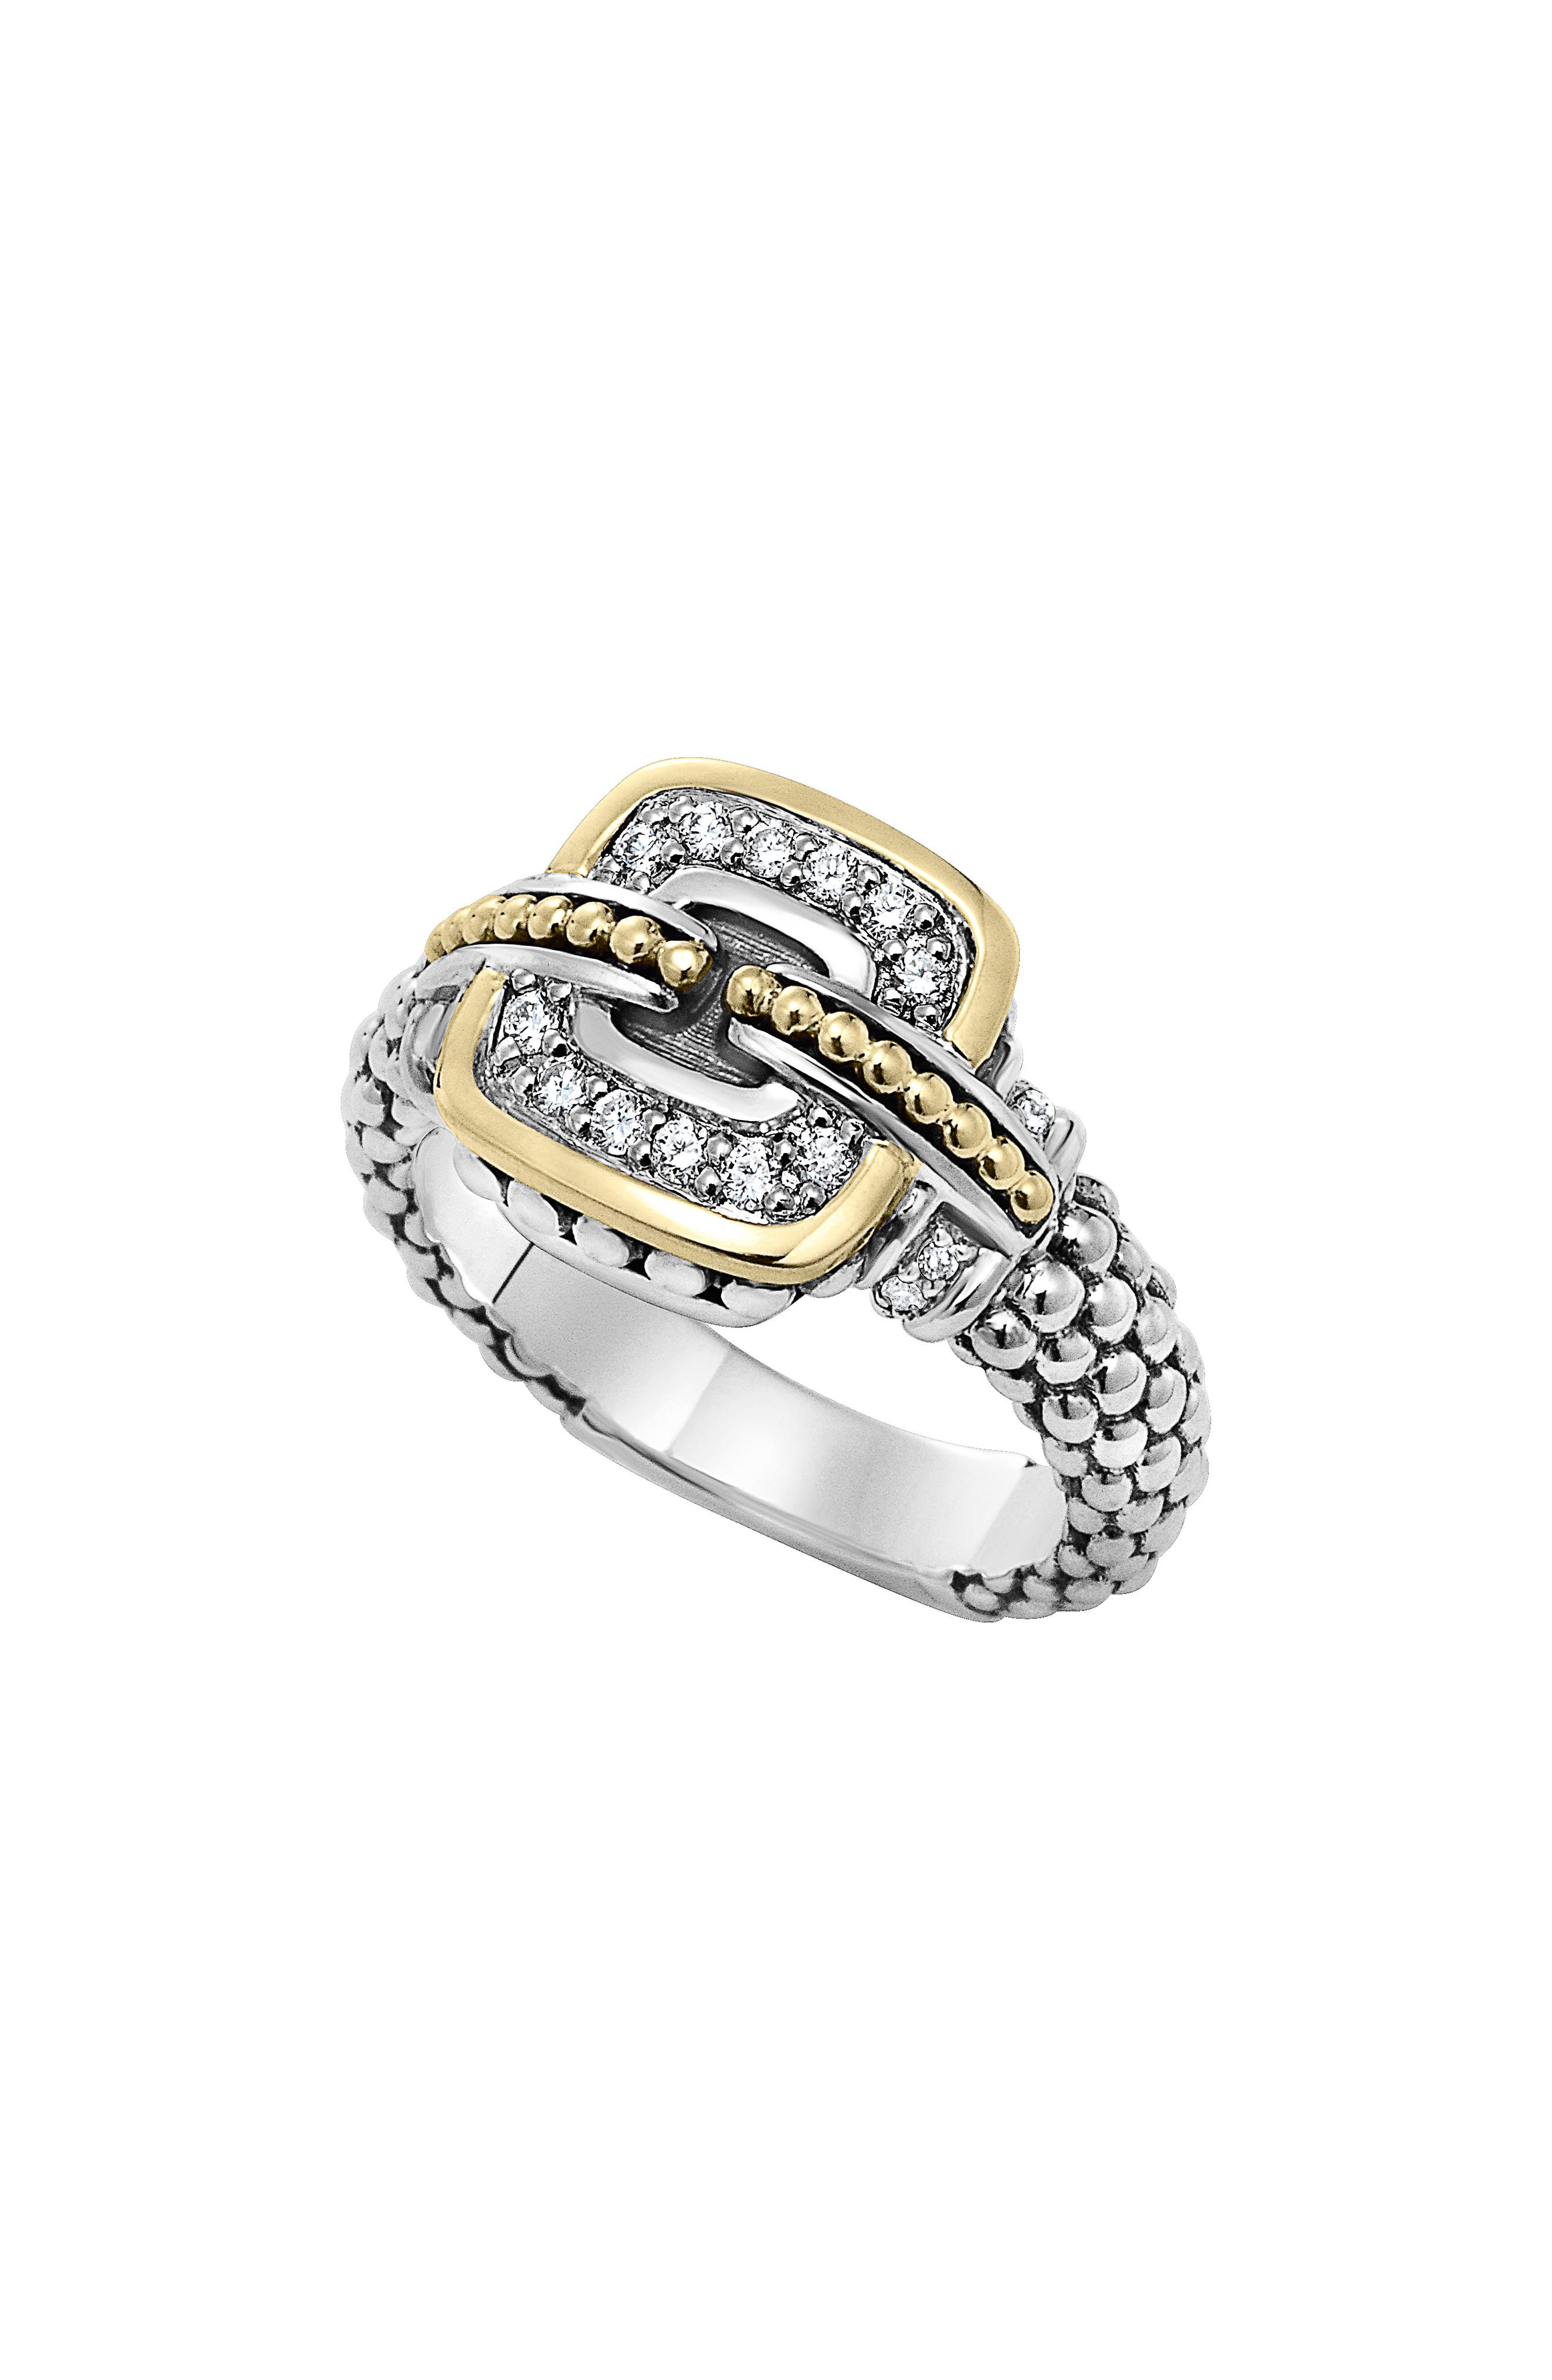 'Cushion' Small Diamond Ring,                         Main,                         color, Silver/ Gold